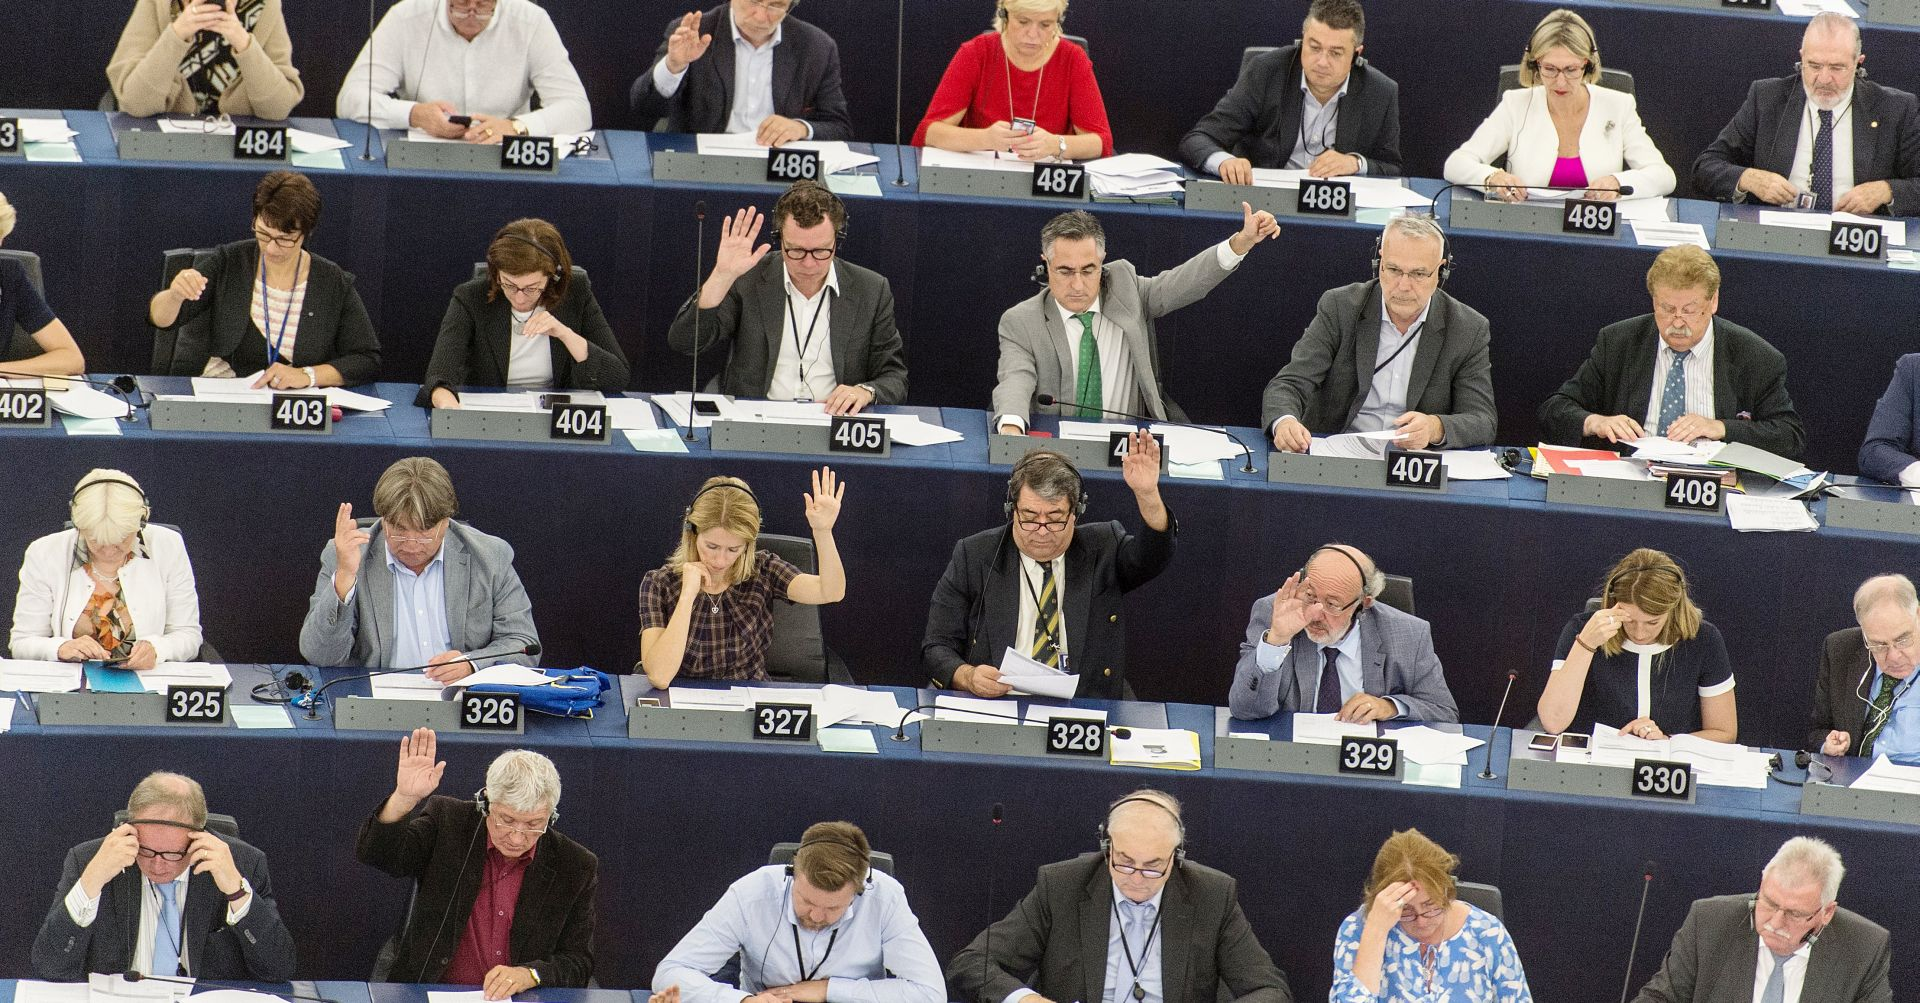 Hrvatski europarlamentarci podržali strategiju širenja EU-a